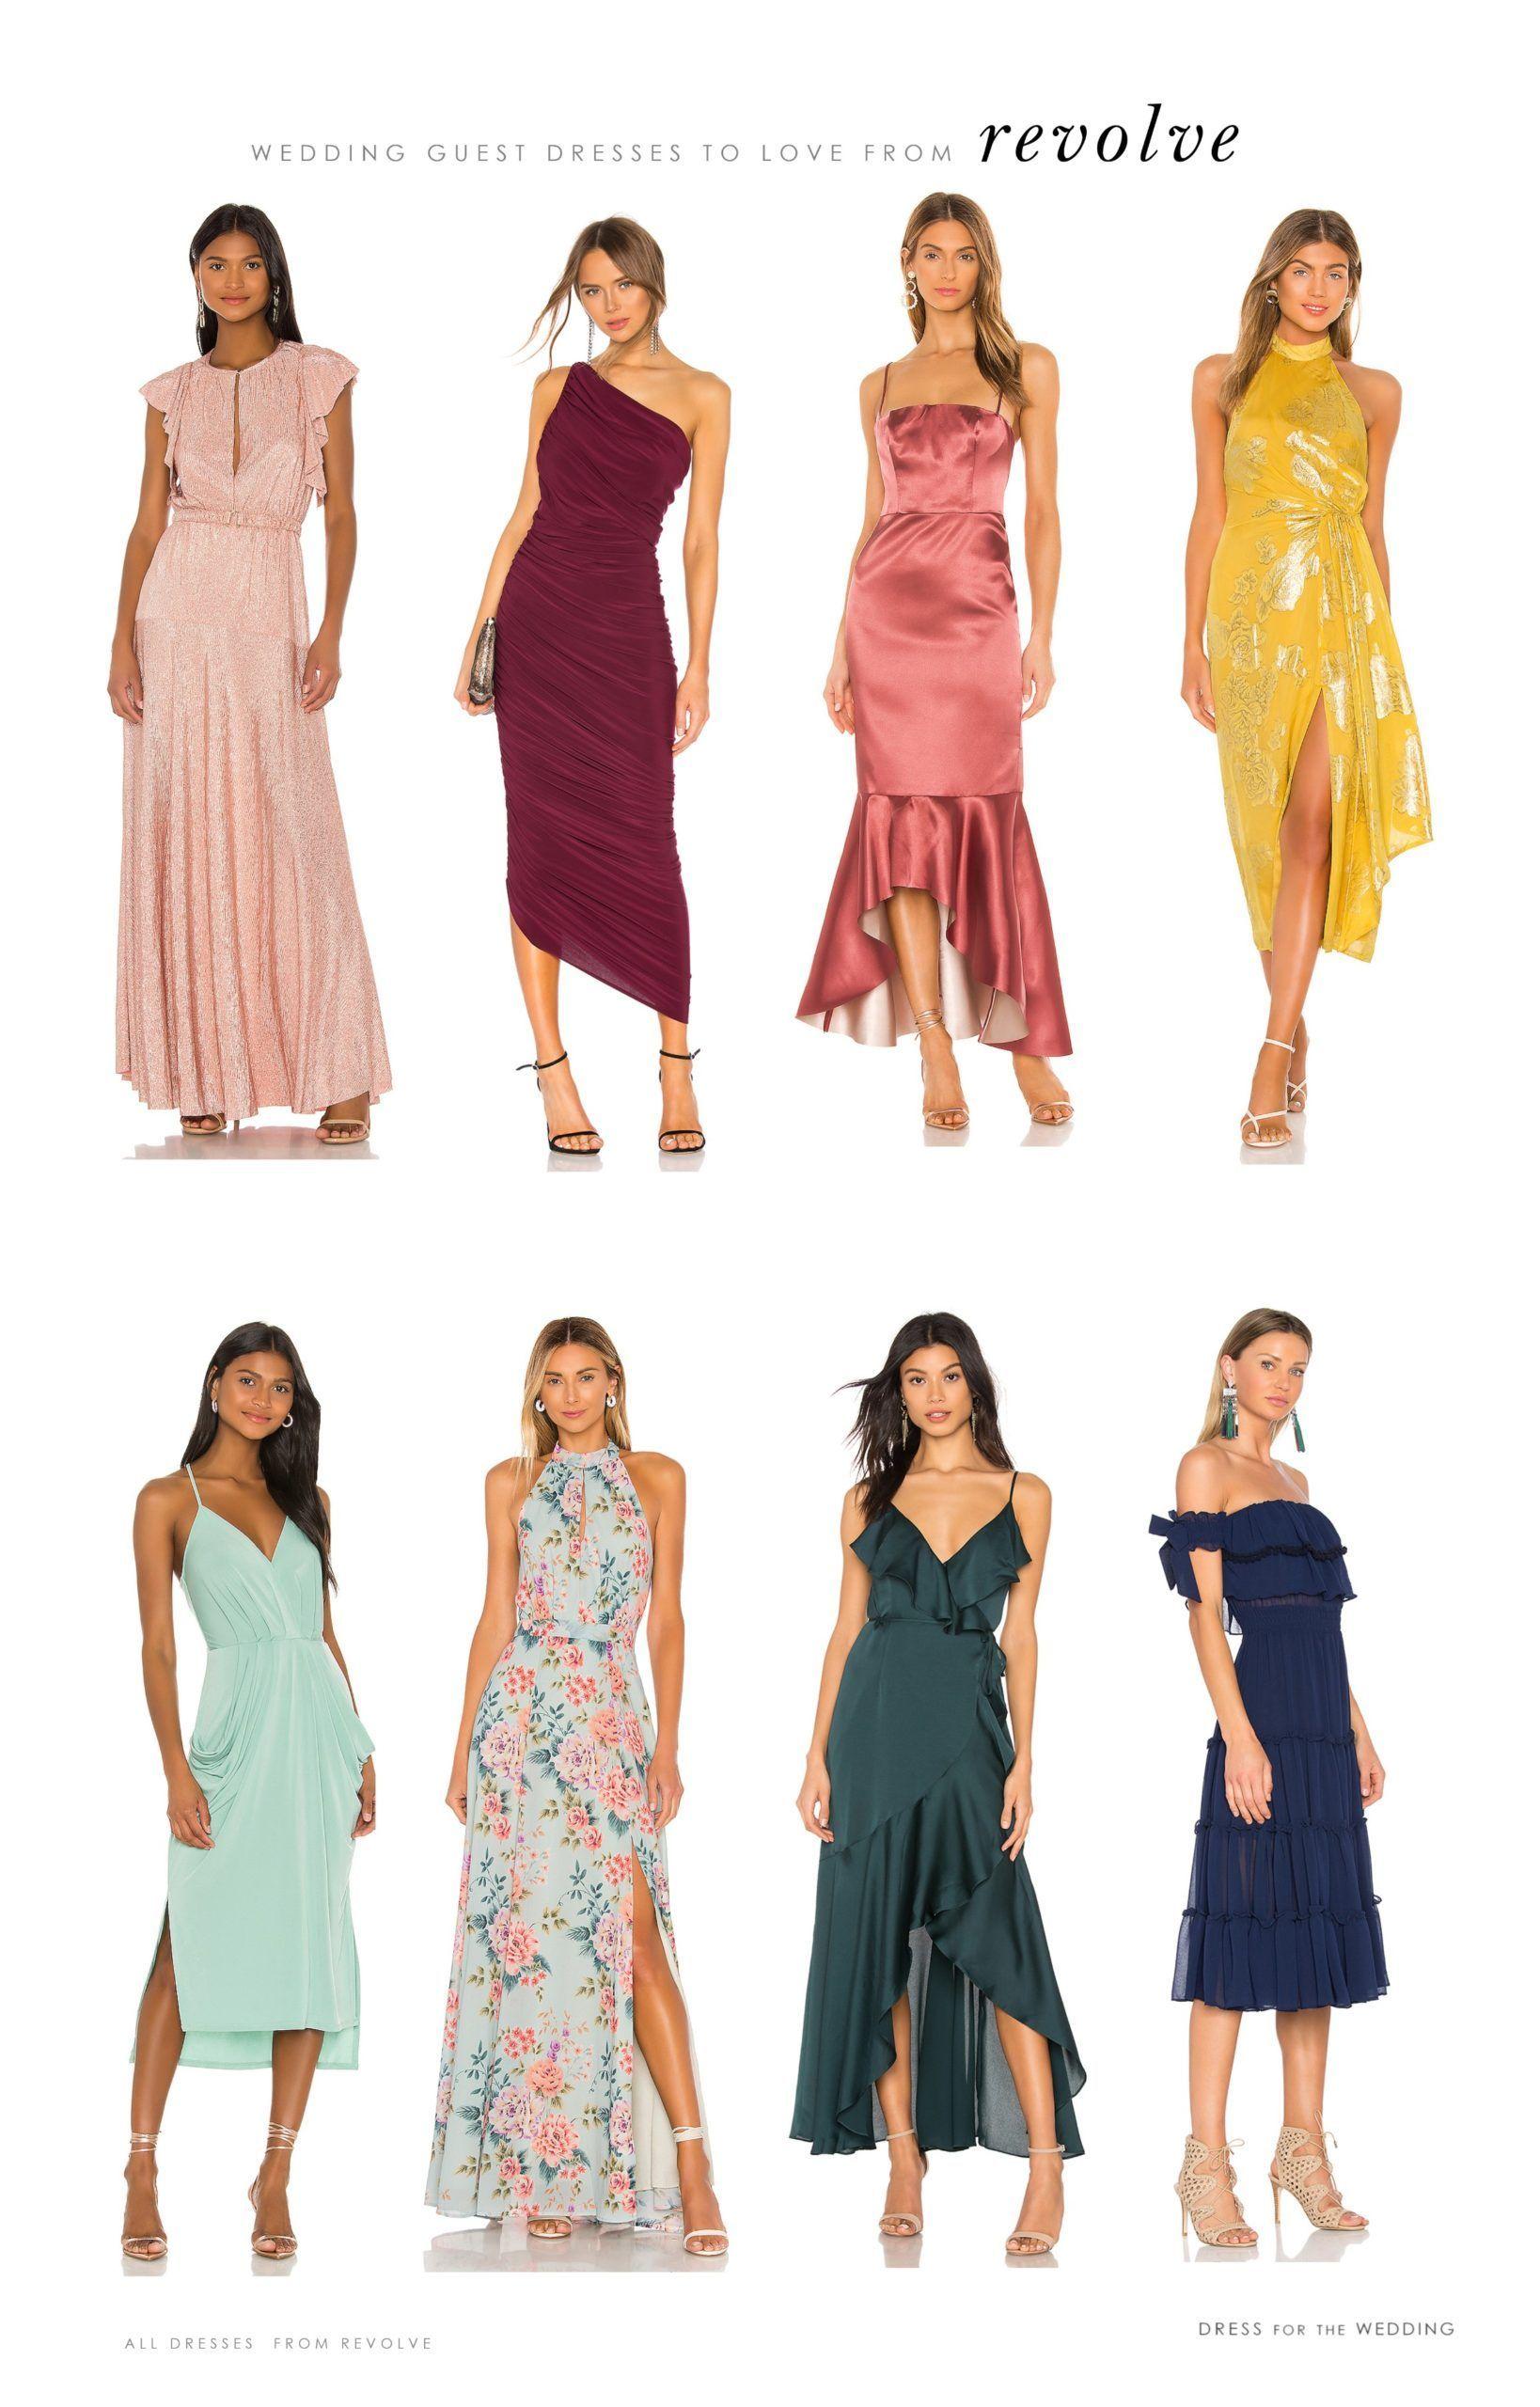 Dresses For Wedding Guests From Revolve Dress For The Wedding Wedding Guest Dress Fall Wedding Attire Revolve Dresses [ 2560 x 1638 Pixel ]